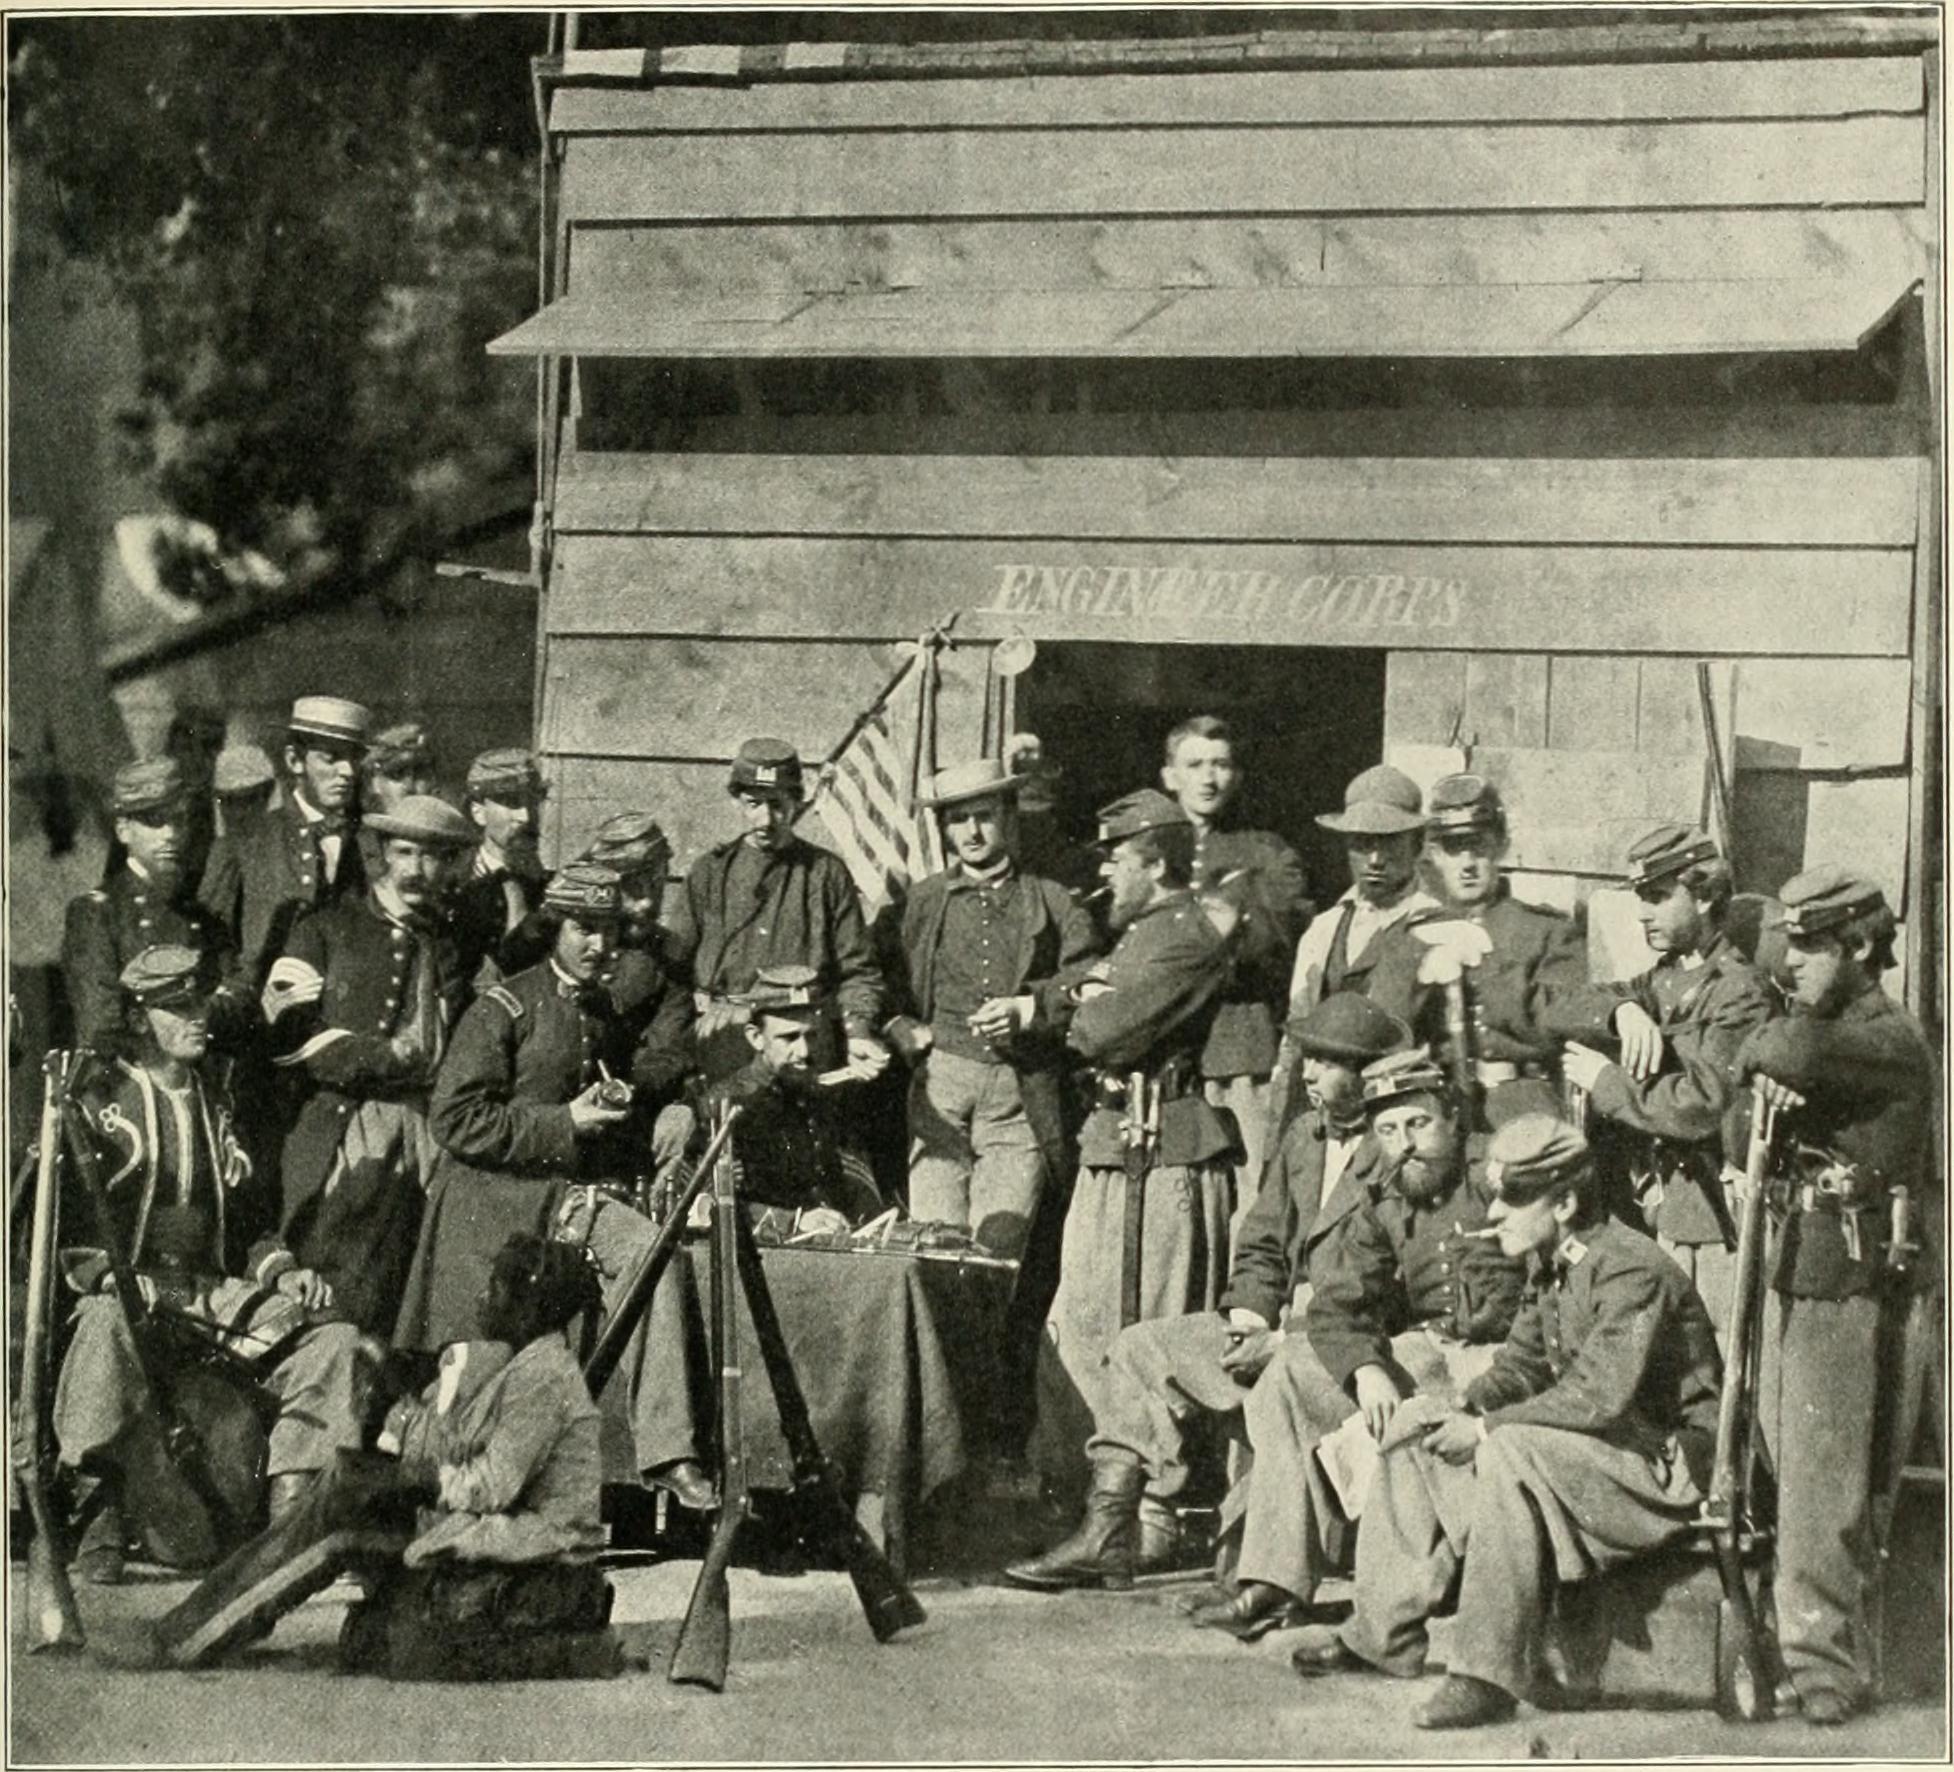 12th New York Volunteer Infantry